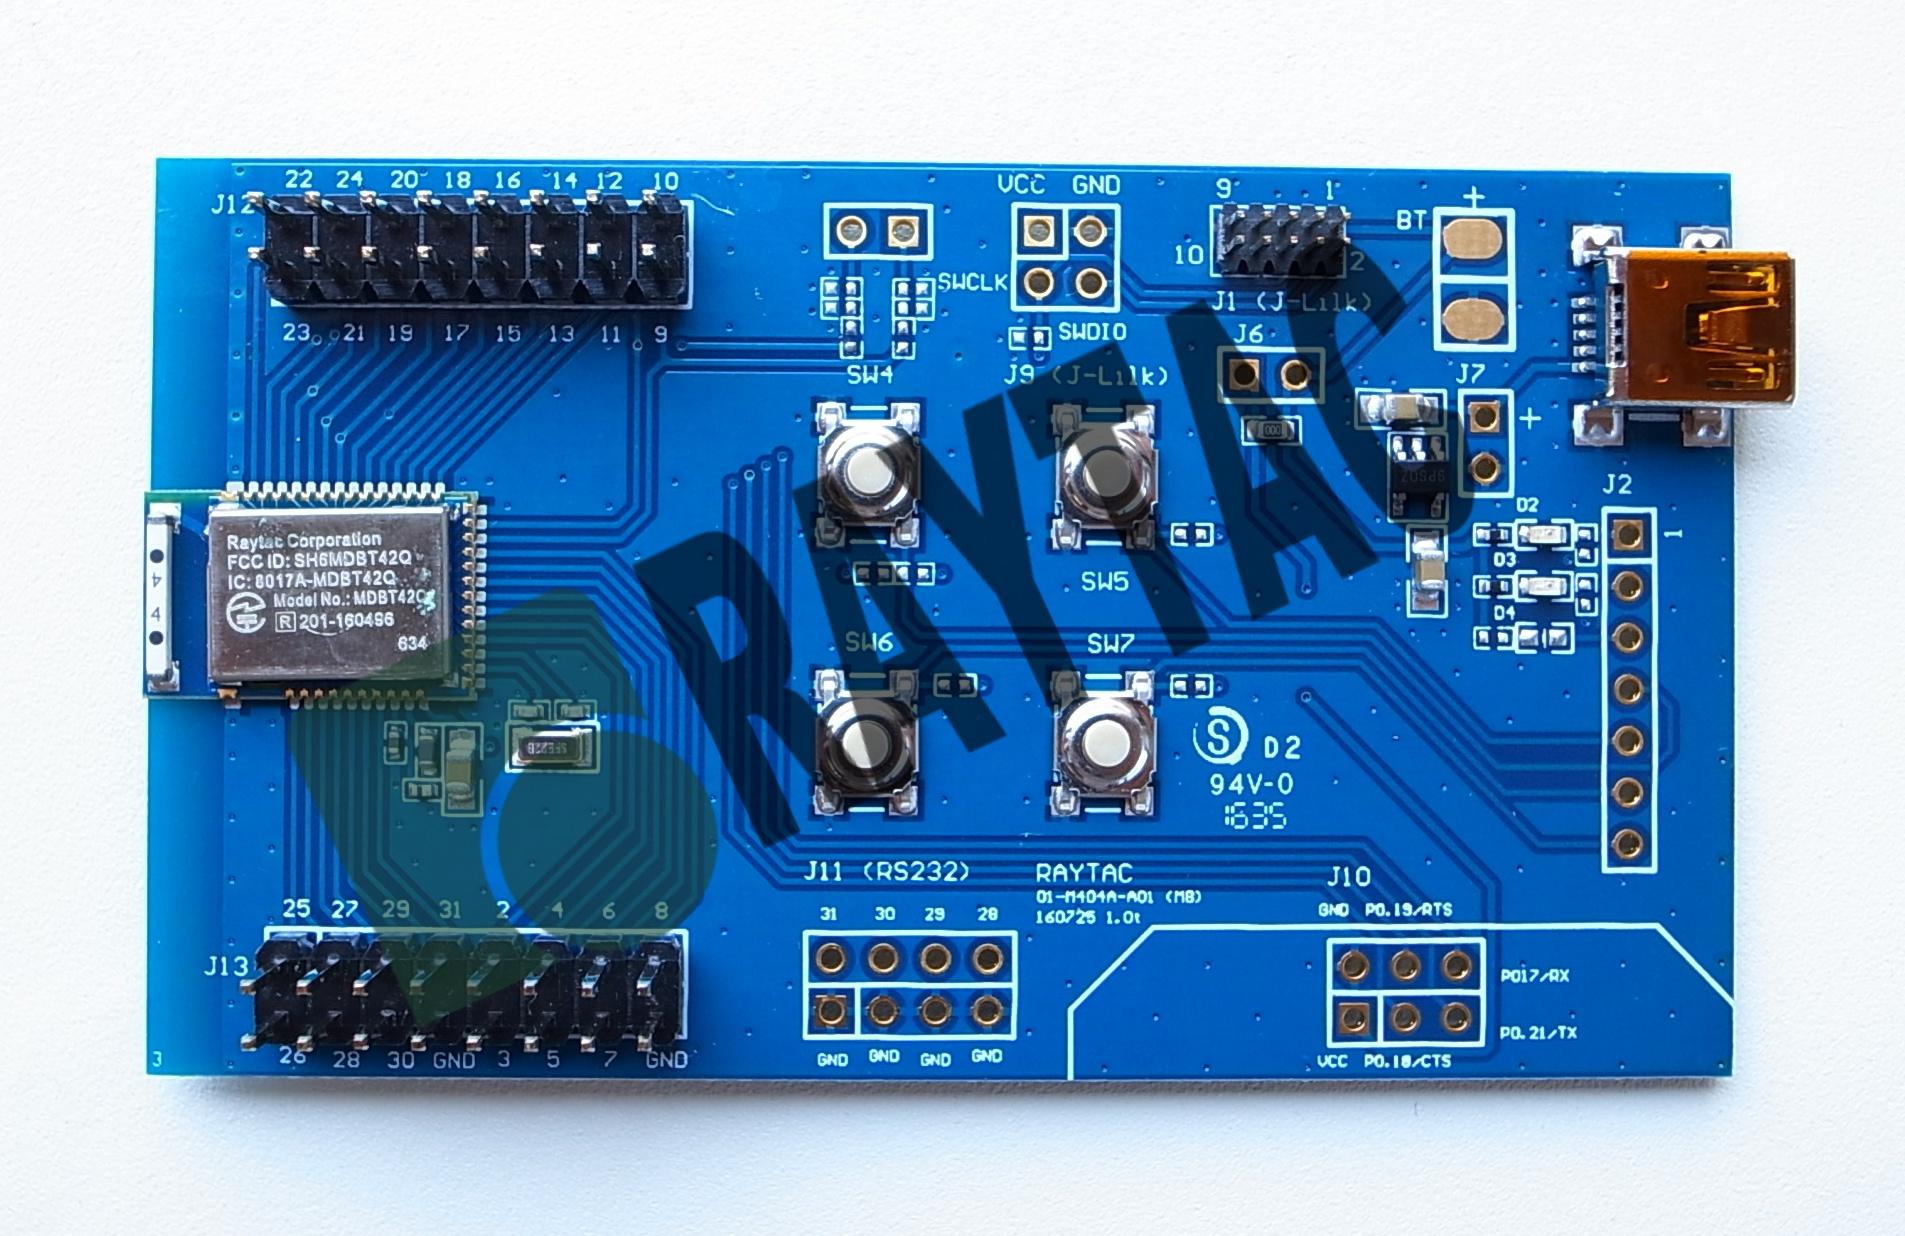 Raytac CorporationBT5/BT4 2/BT4 1/BT4 0 Module MakernRF52810